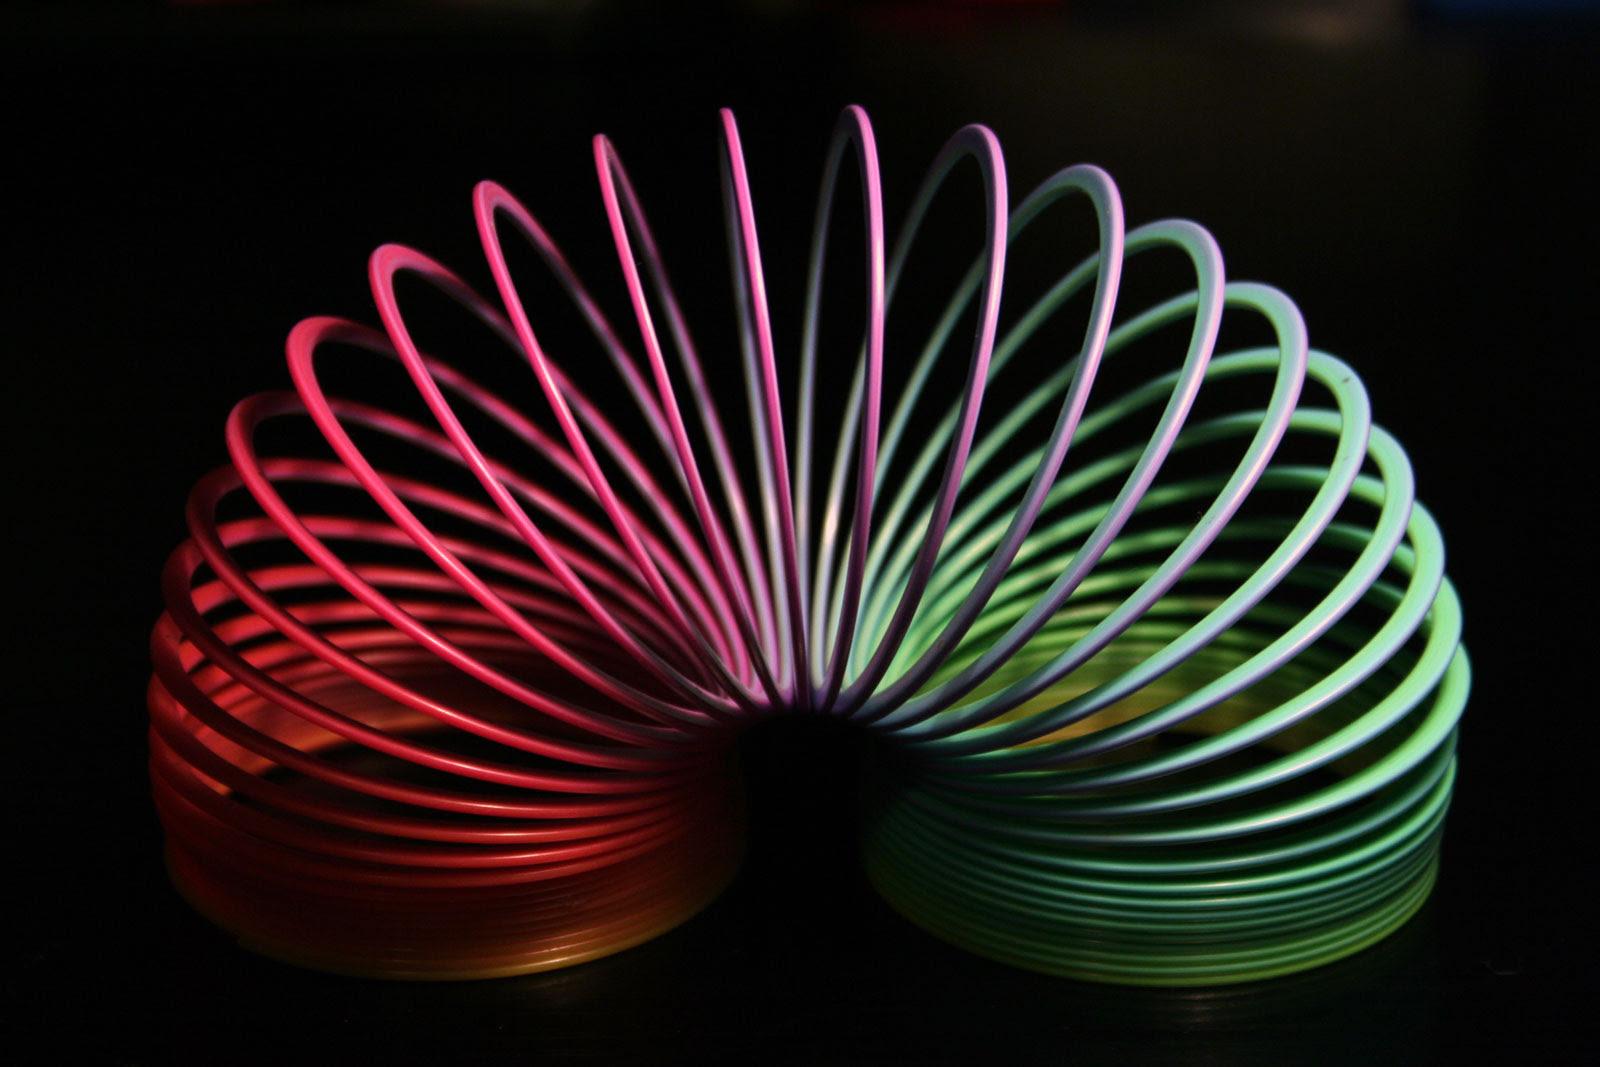 rainbow plastic slinky in arc shape